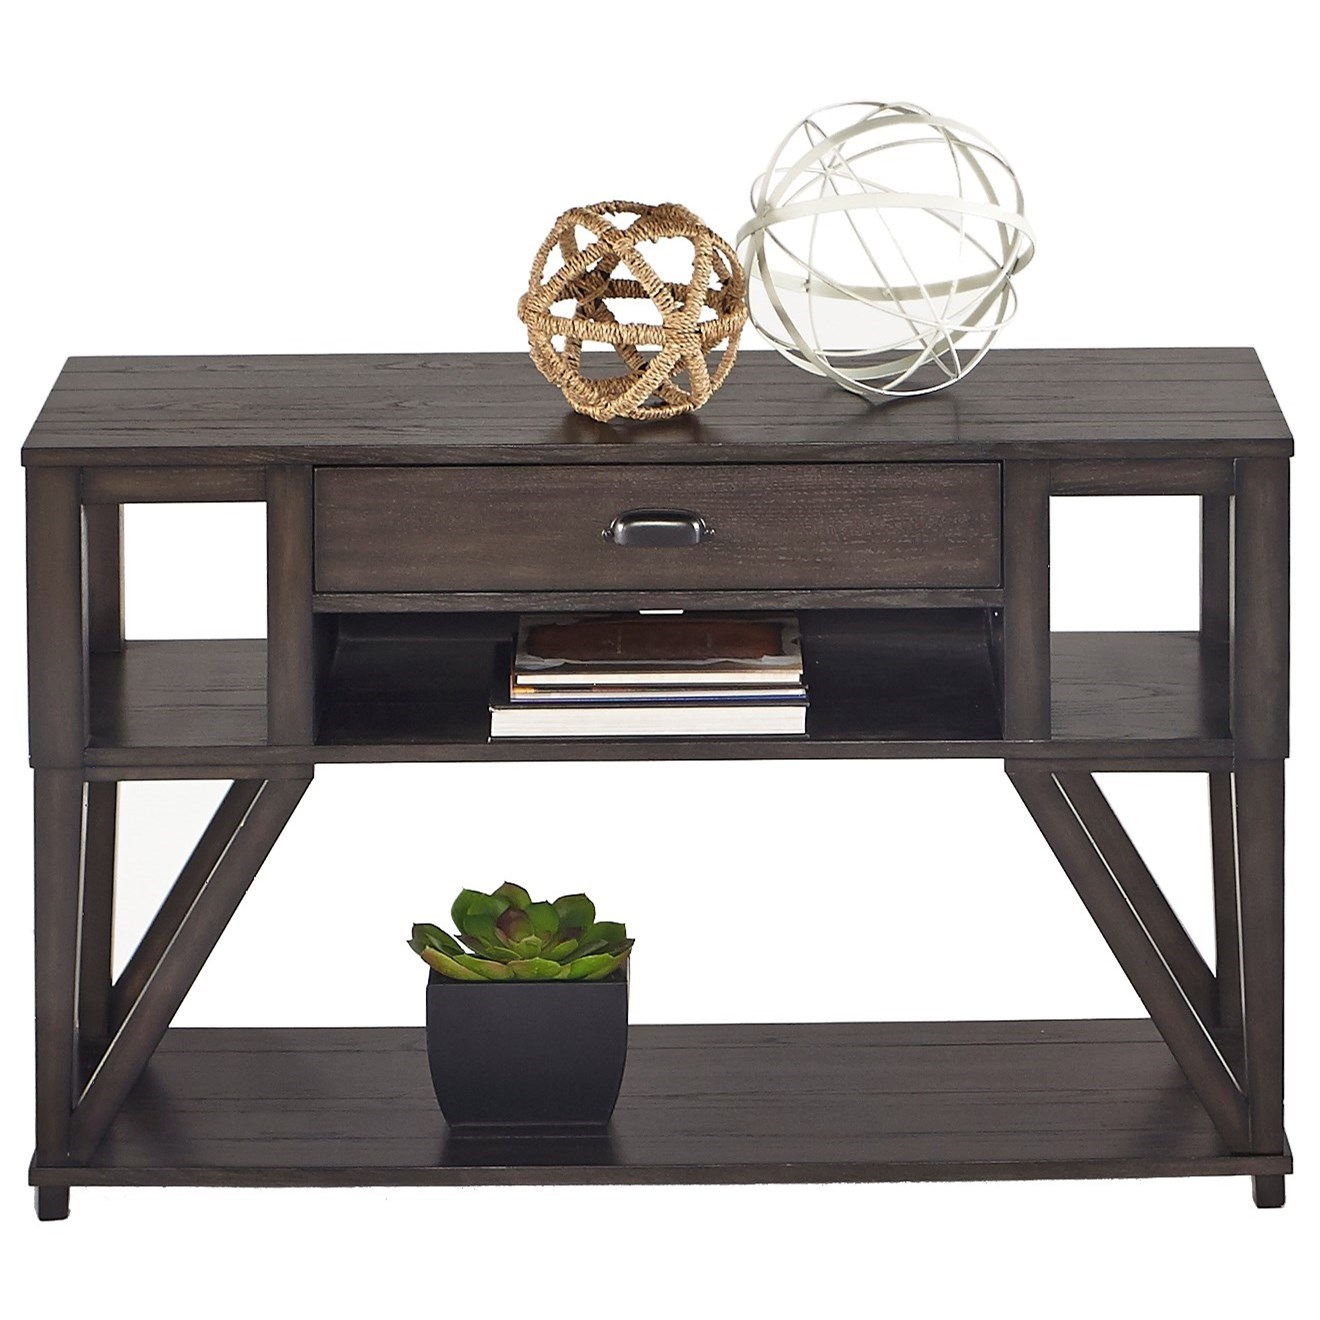 Consort Sofa/Console Table by Progressive Furniture at Darvin Furniture